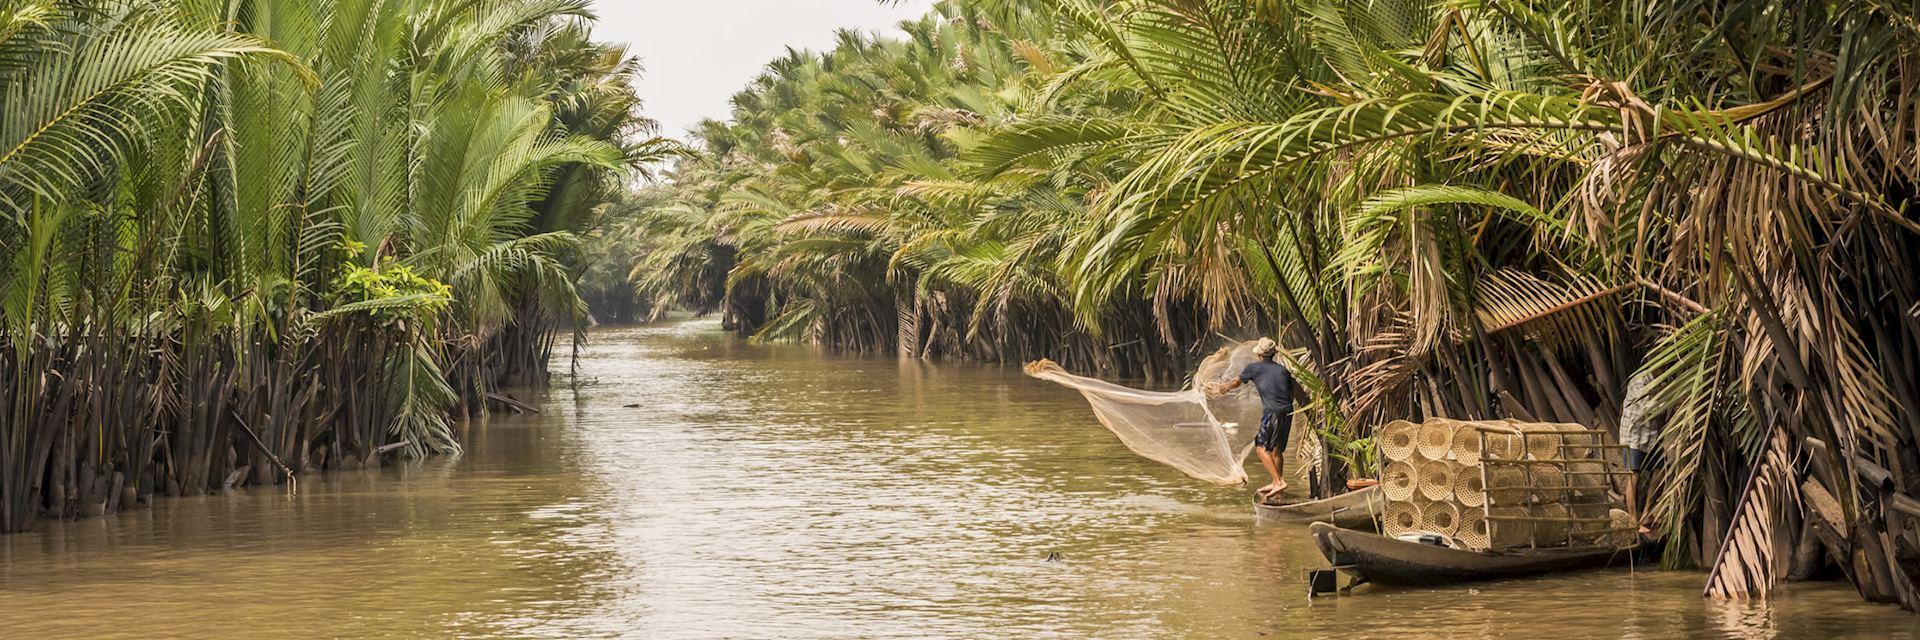 Fishing on the Mekong River, Vietnam